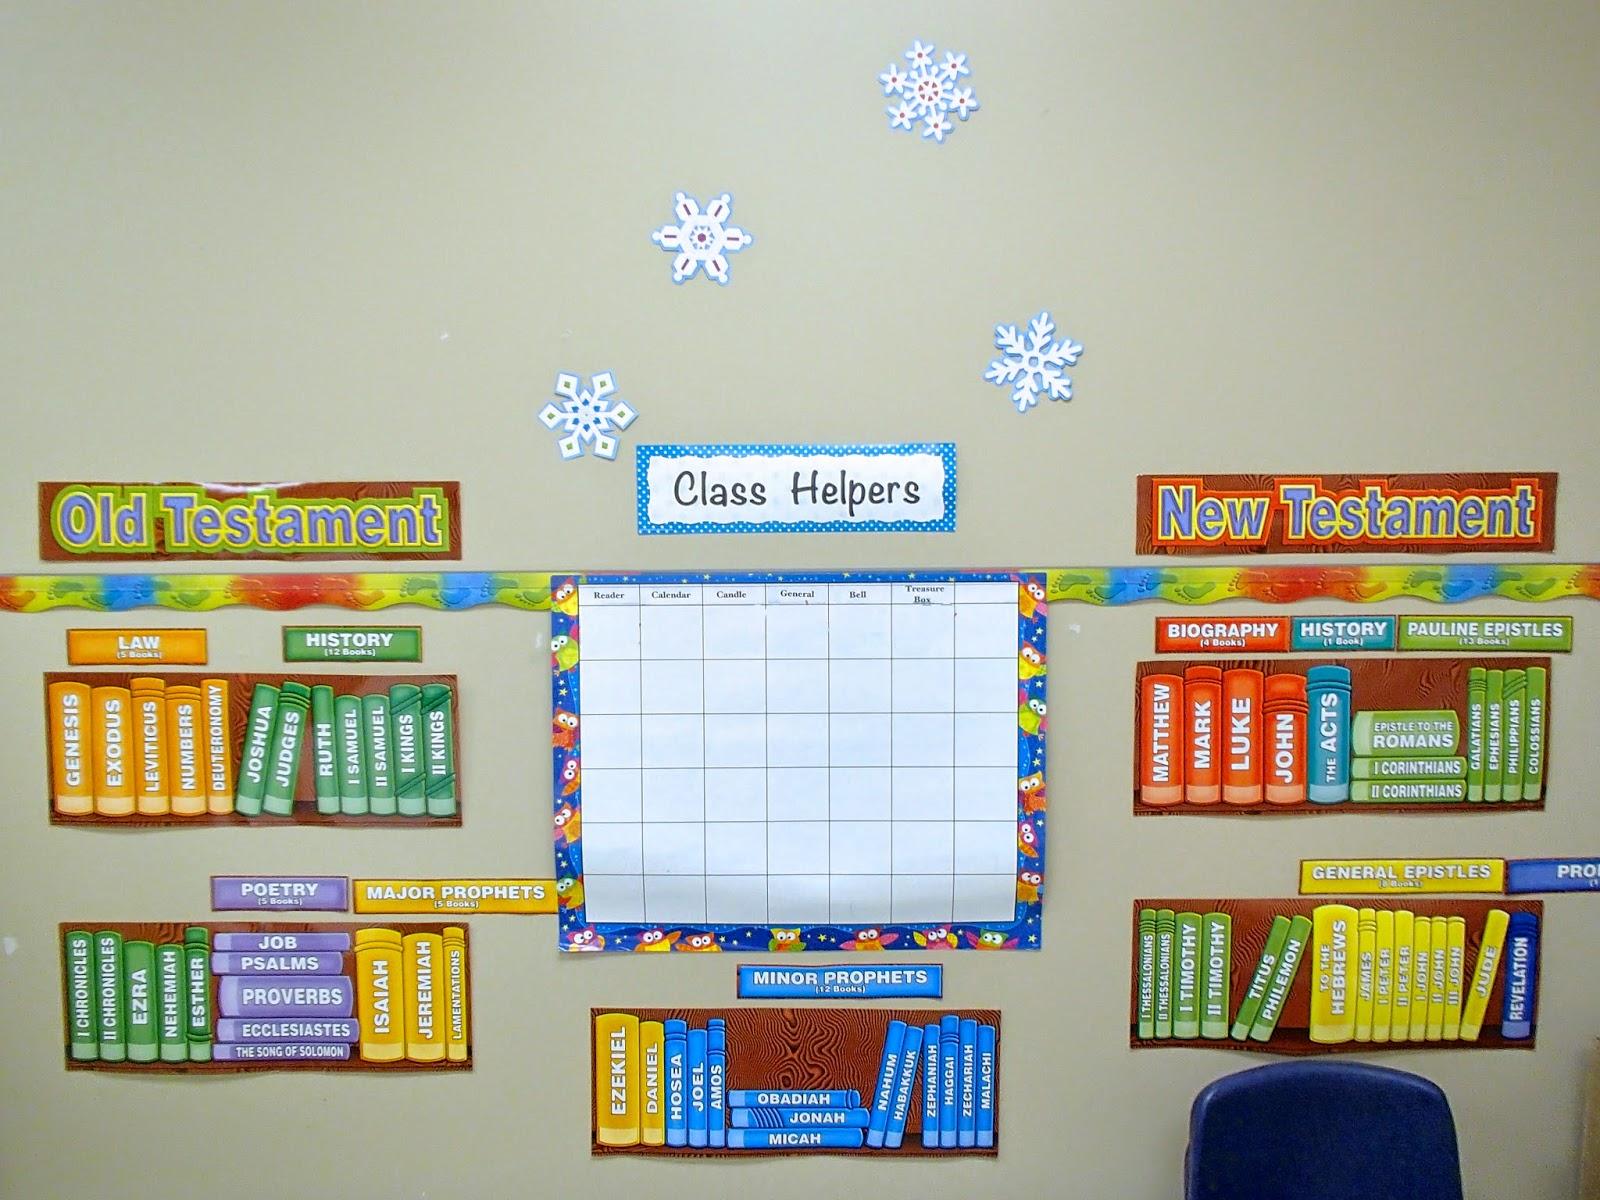 Sunday School Classroom Design Ideas ~ Easy breezy sunday school winter door decorations